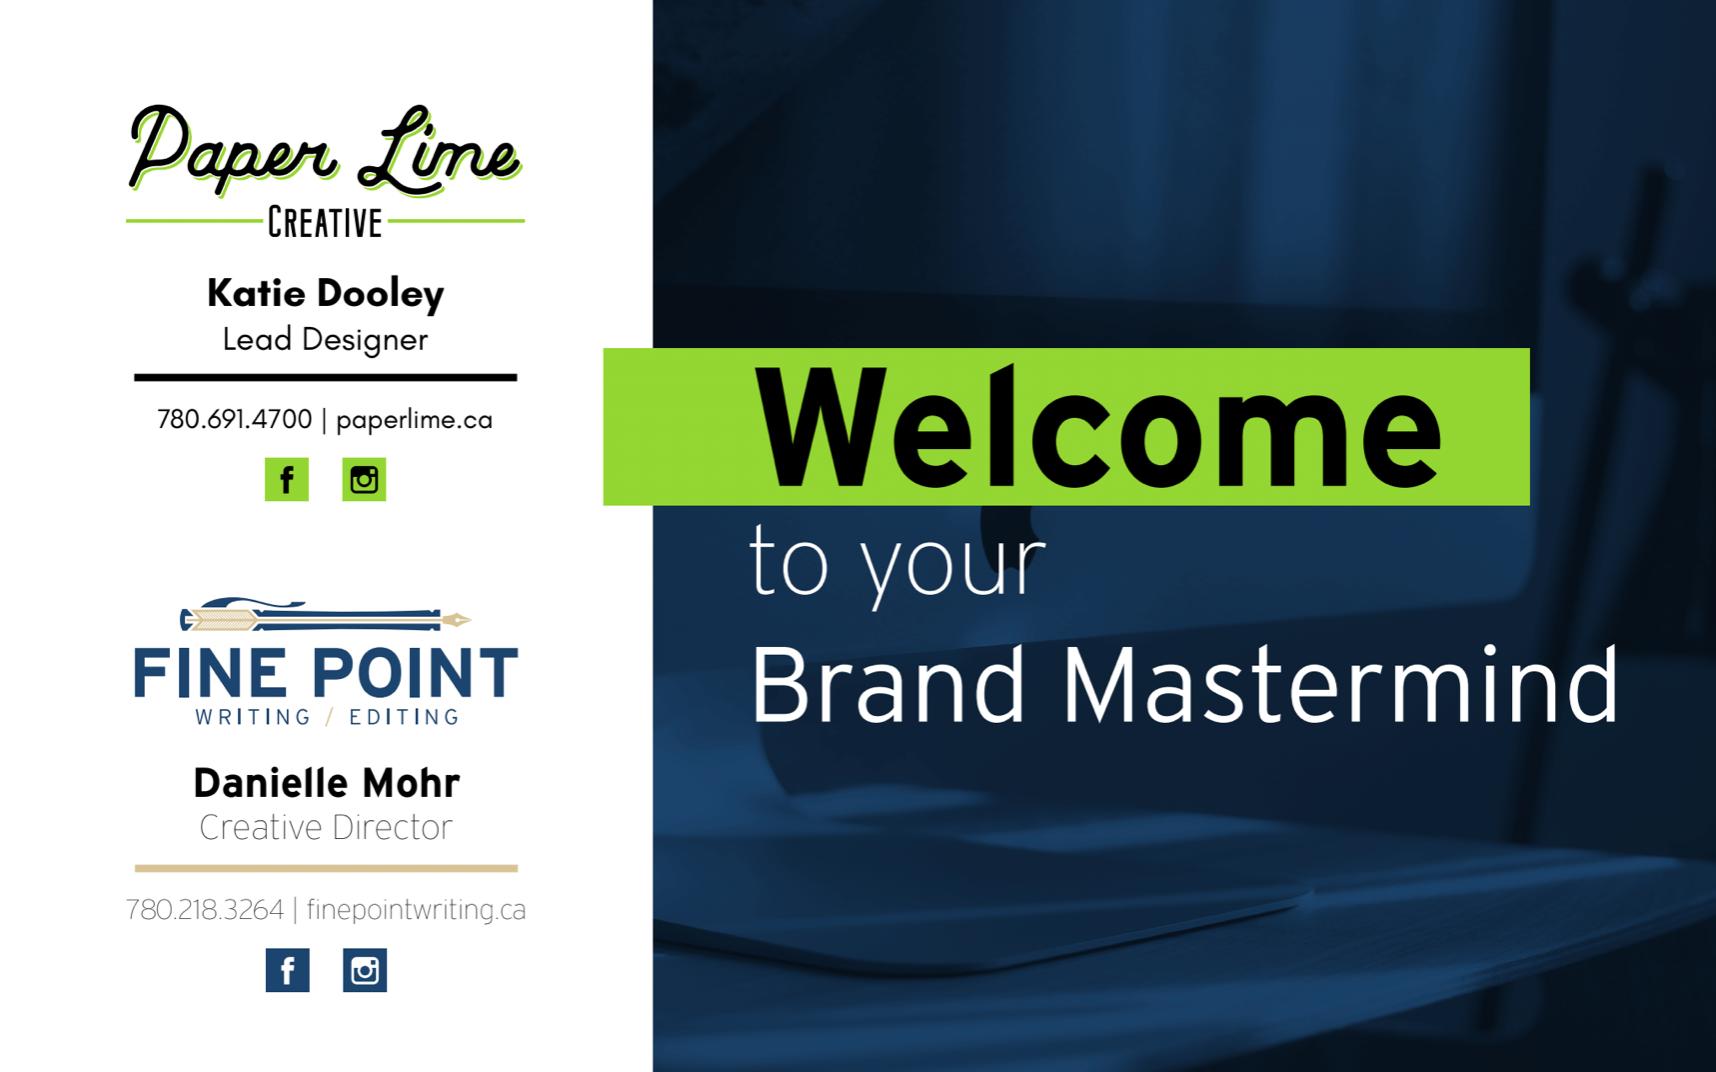 brand mastermind workshop presentation page